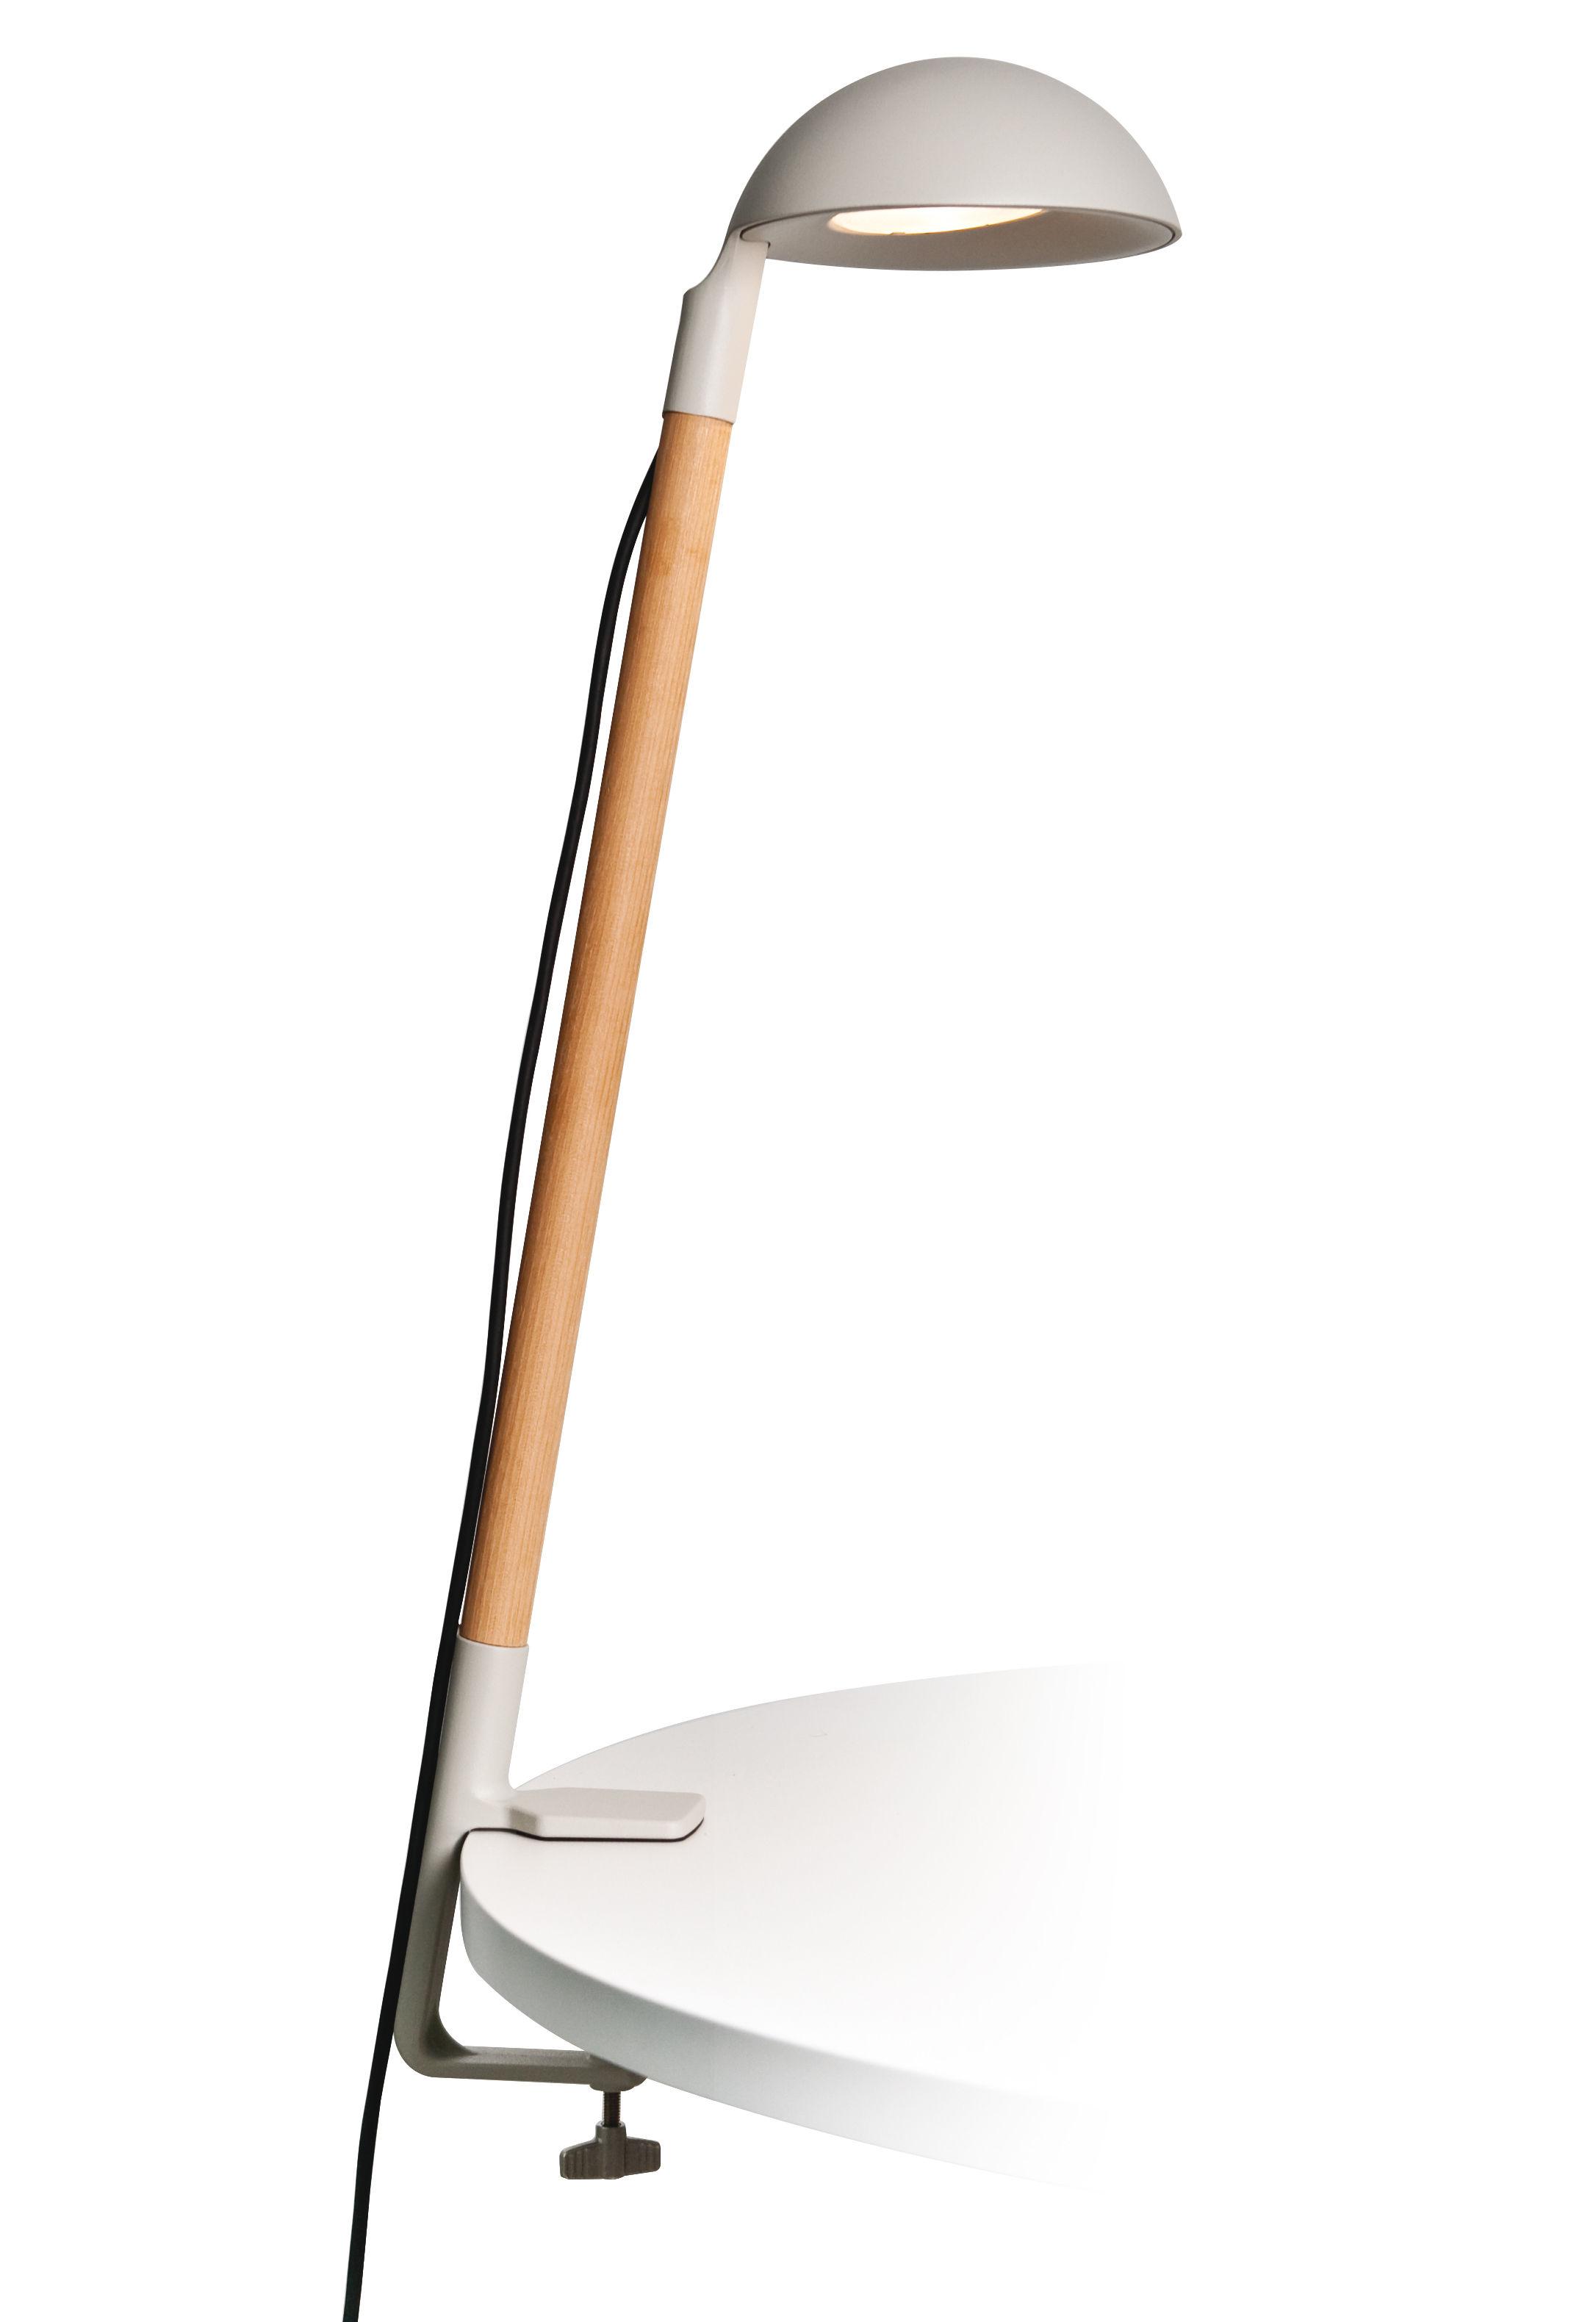 Luminaire - Lampes de table - Lampe Tools LED Indoor / Base étau - H 88 cm - Roger Pradier - Gris clair - Aluminium, Bois d'acacia